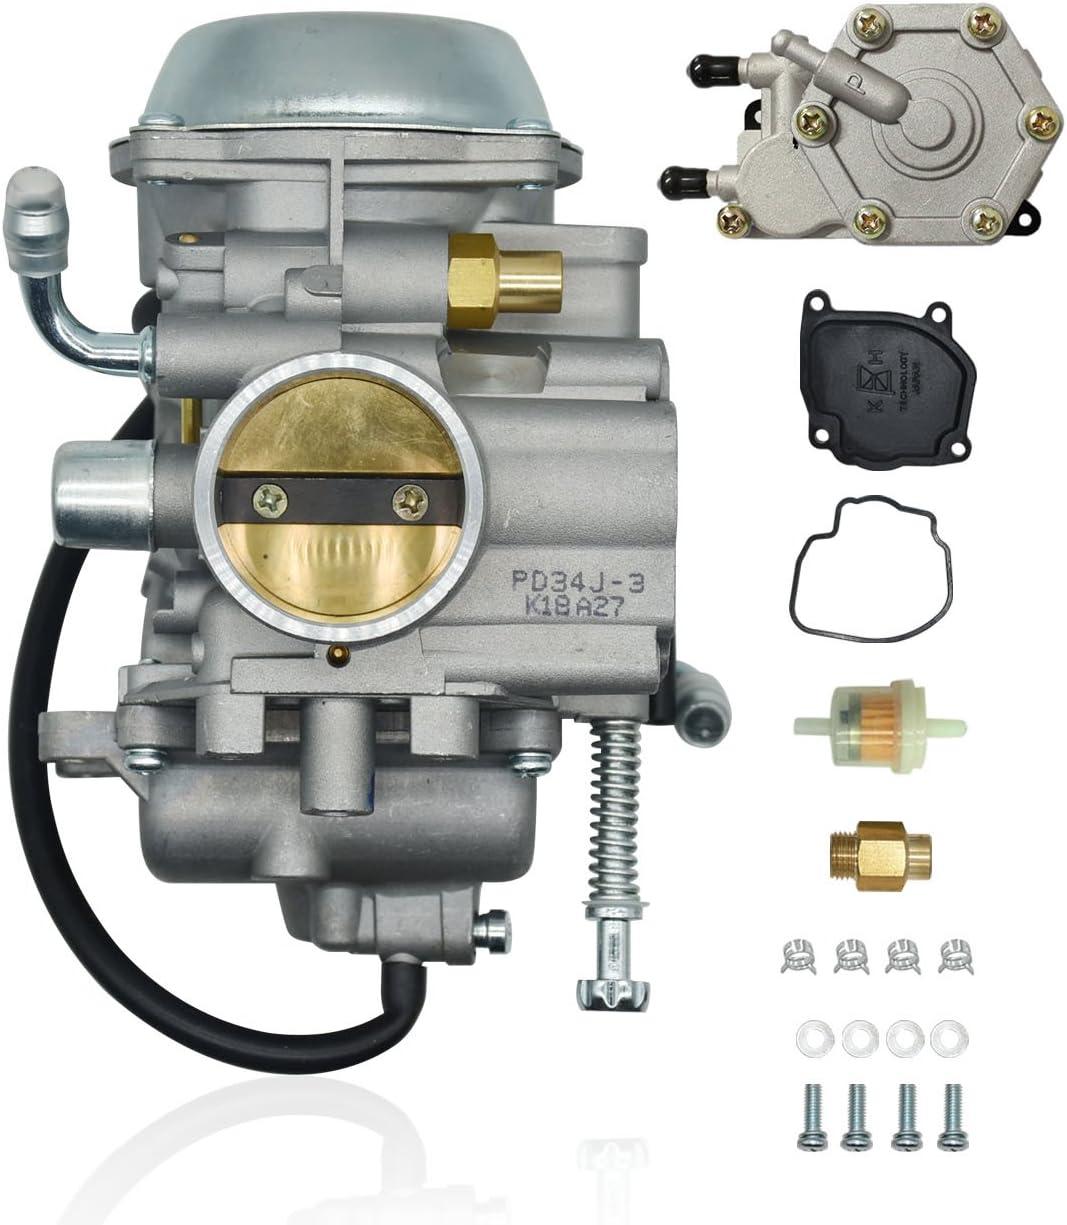 Karbay Carburetor Fuel Pump For Polaris Sportsman 500 ATV Quad Carb 1996-1998 NON HO